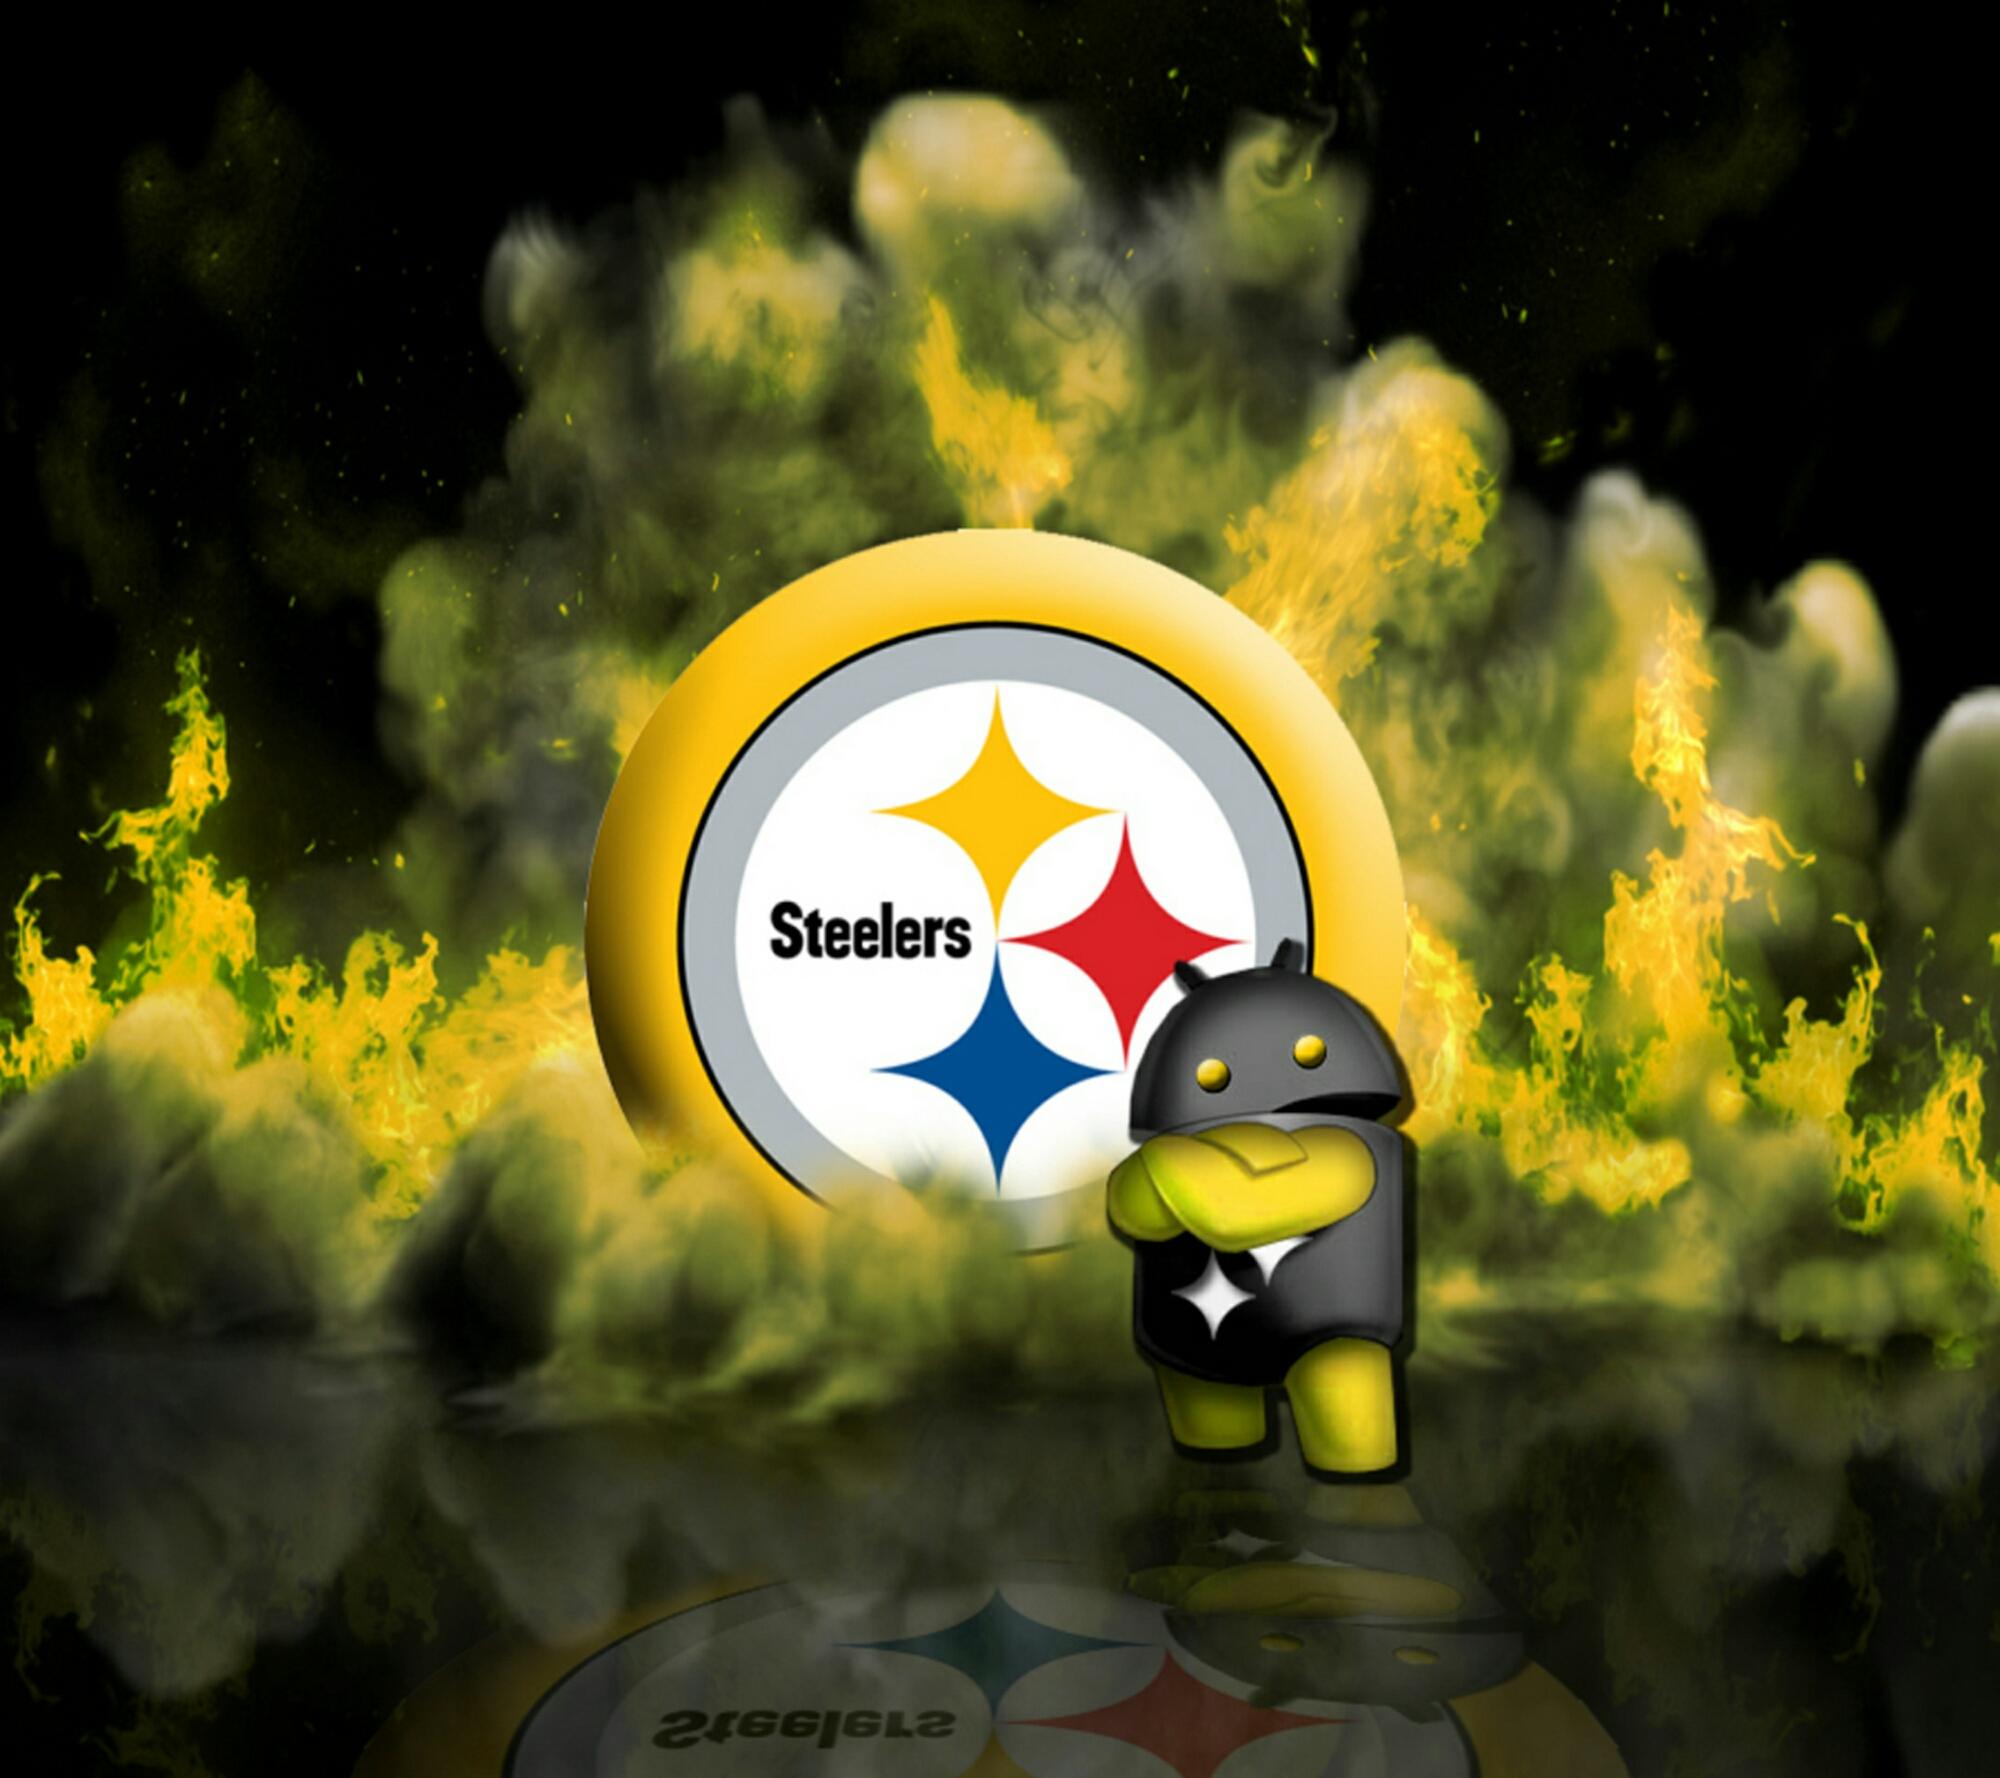 Steelers wallpaper 9952223jpg 2000x1778